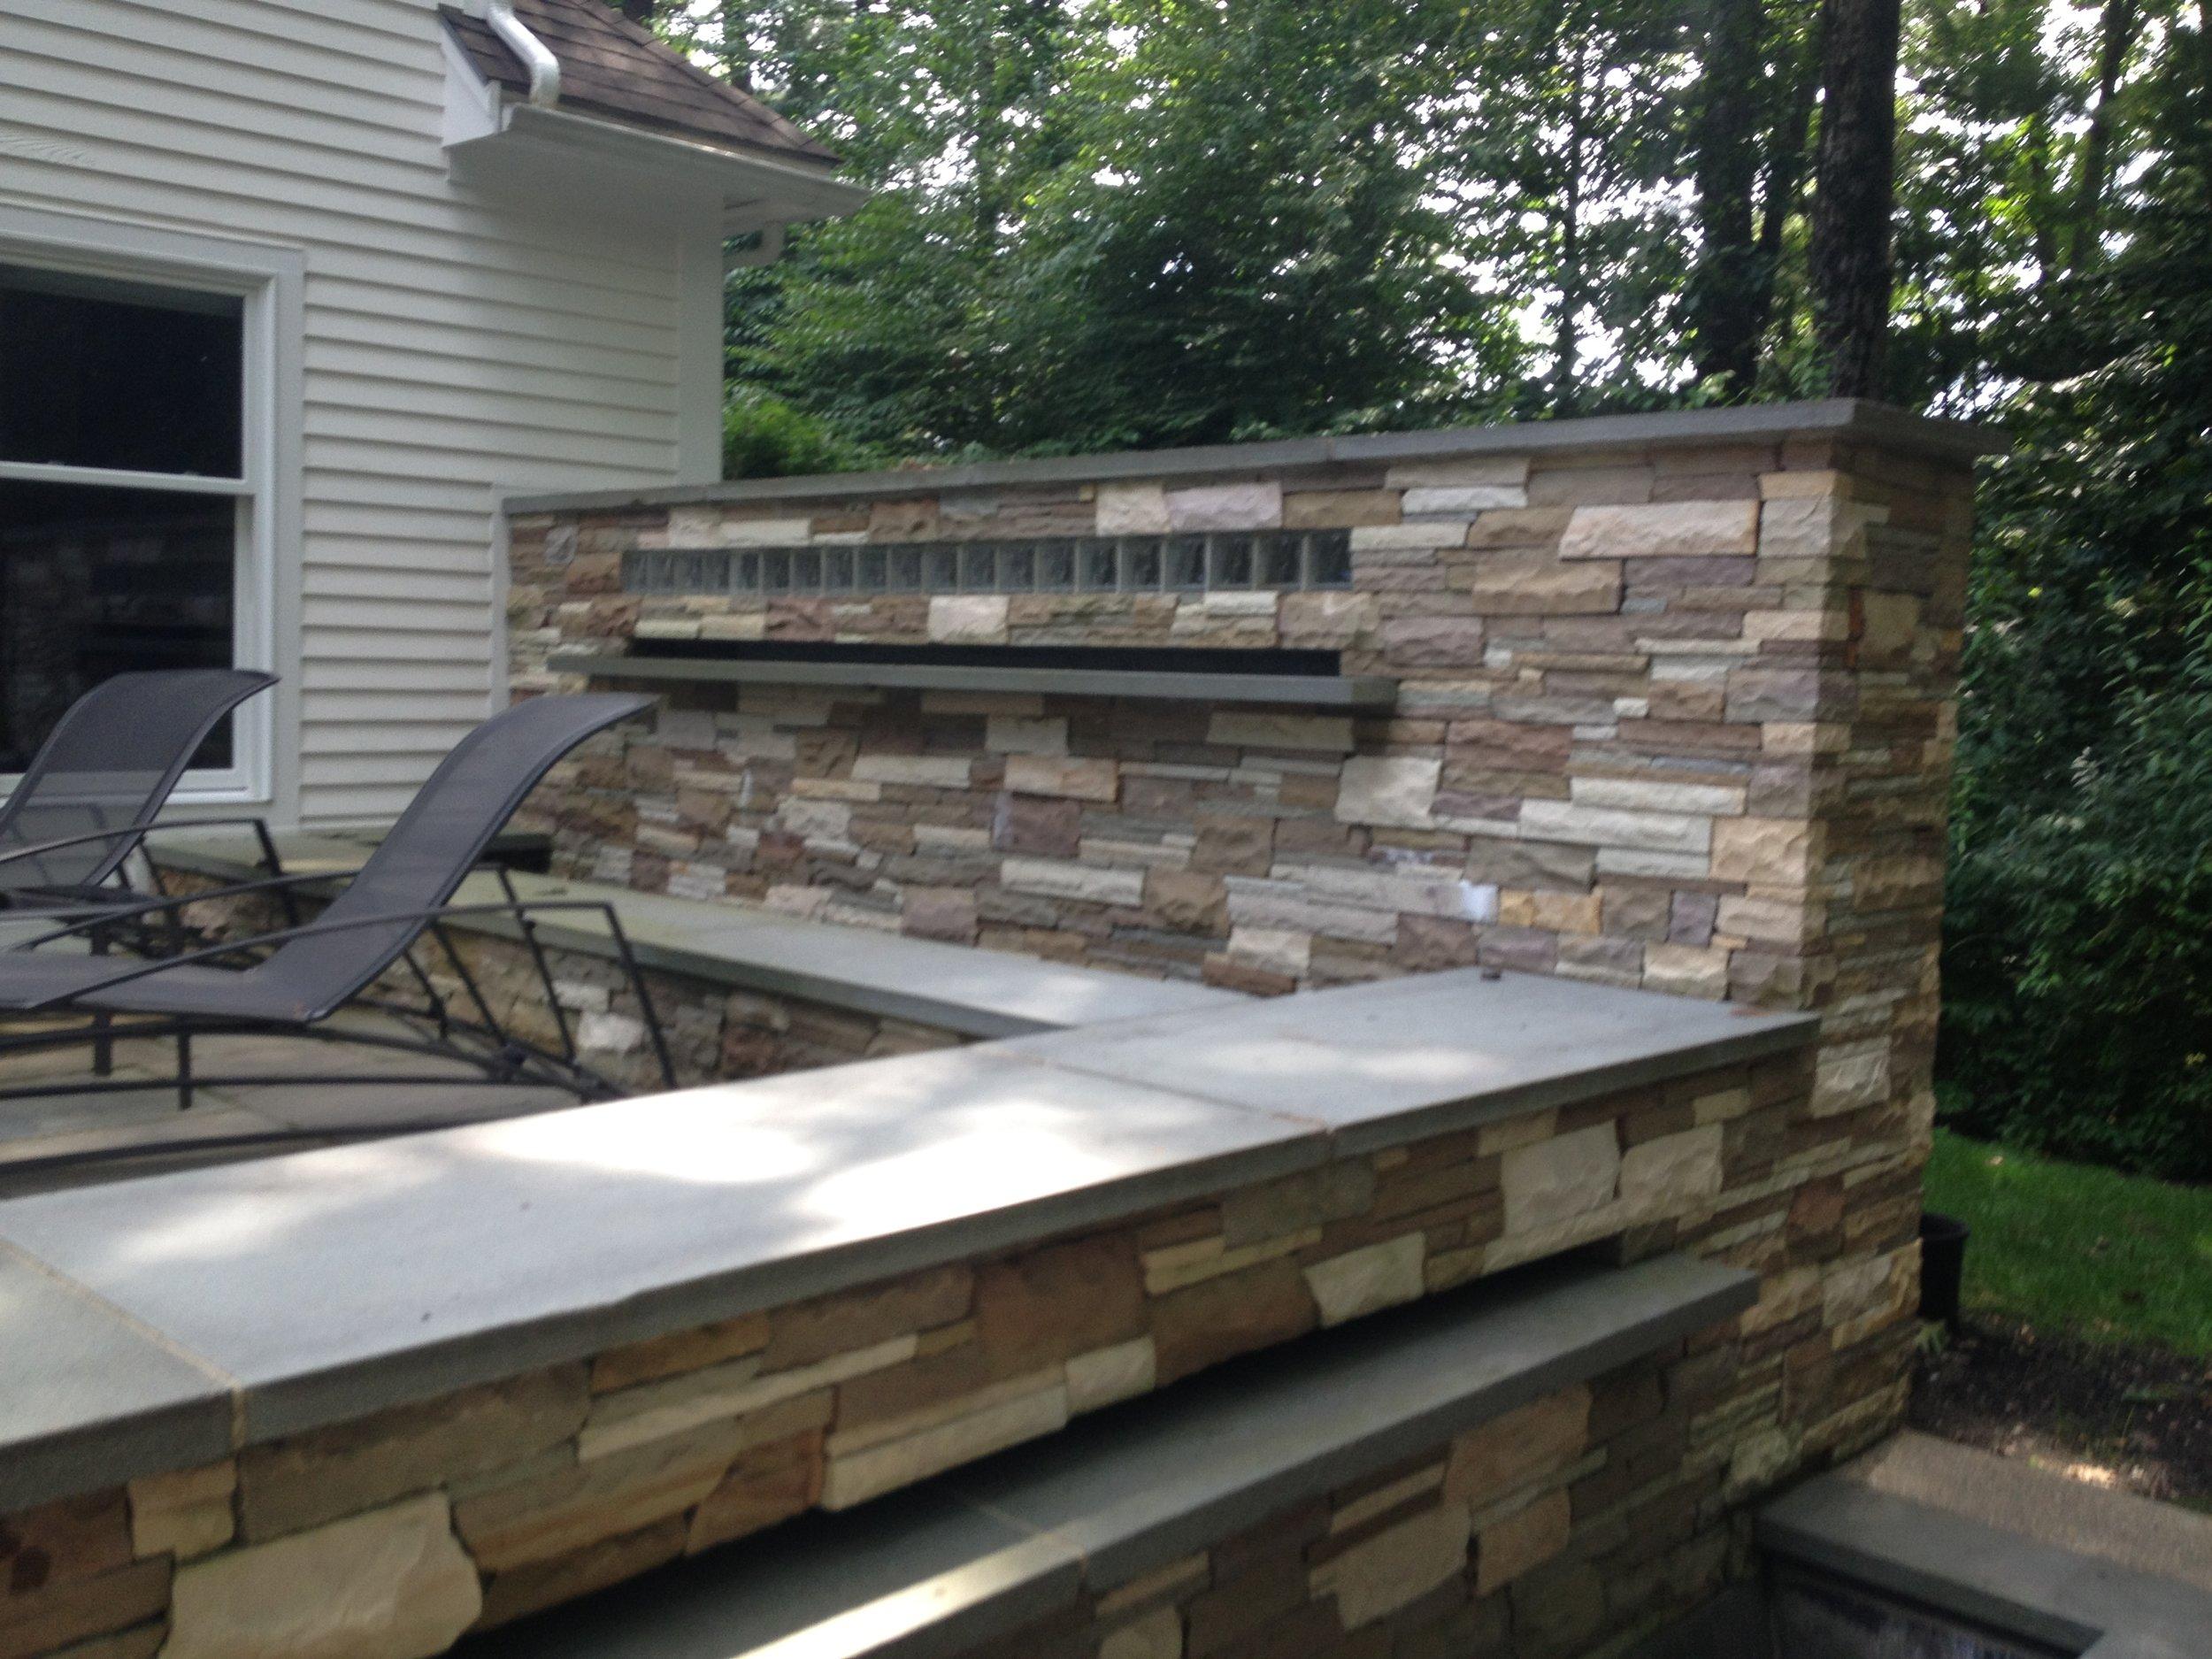 Top landscaping design company mason inLaconia, NH